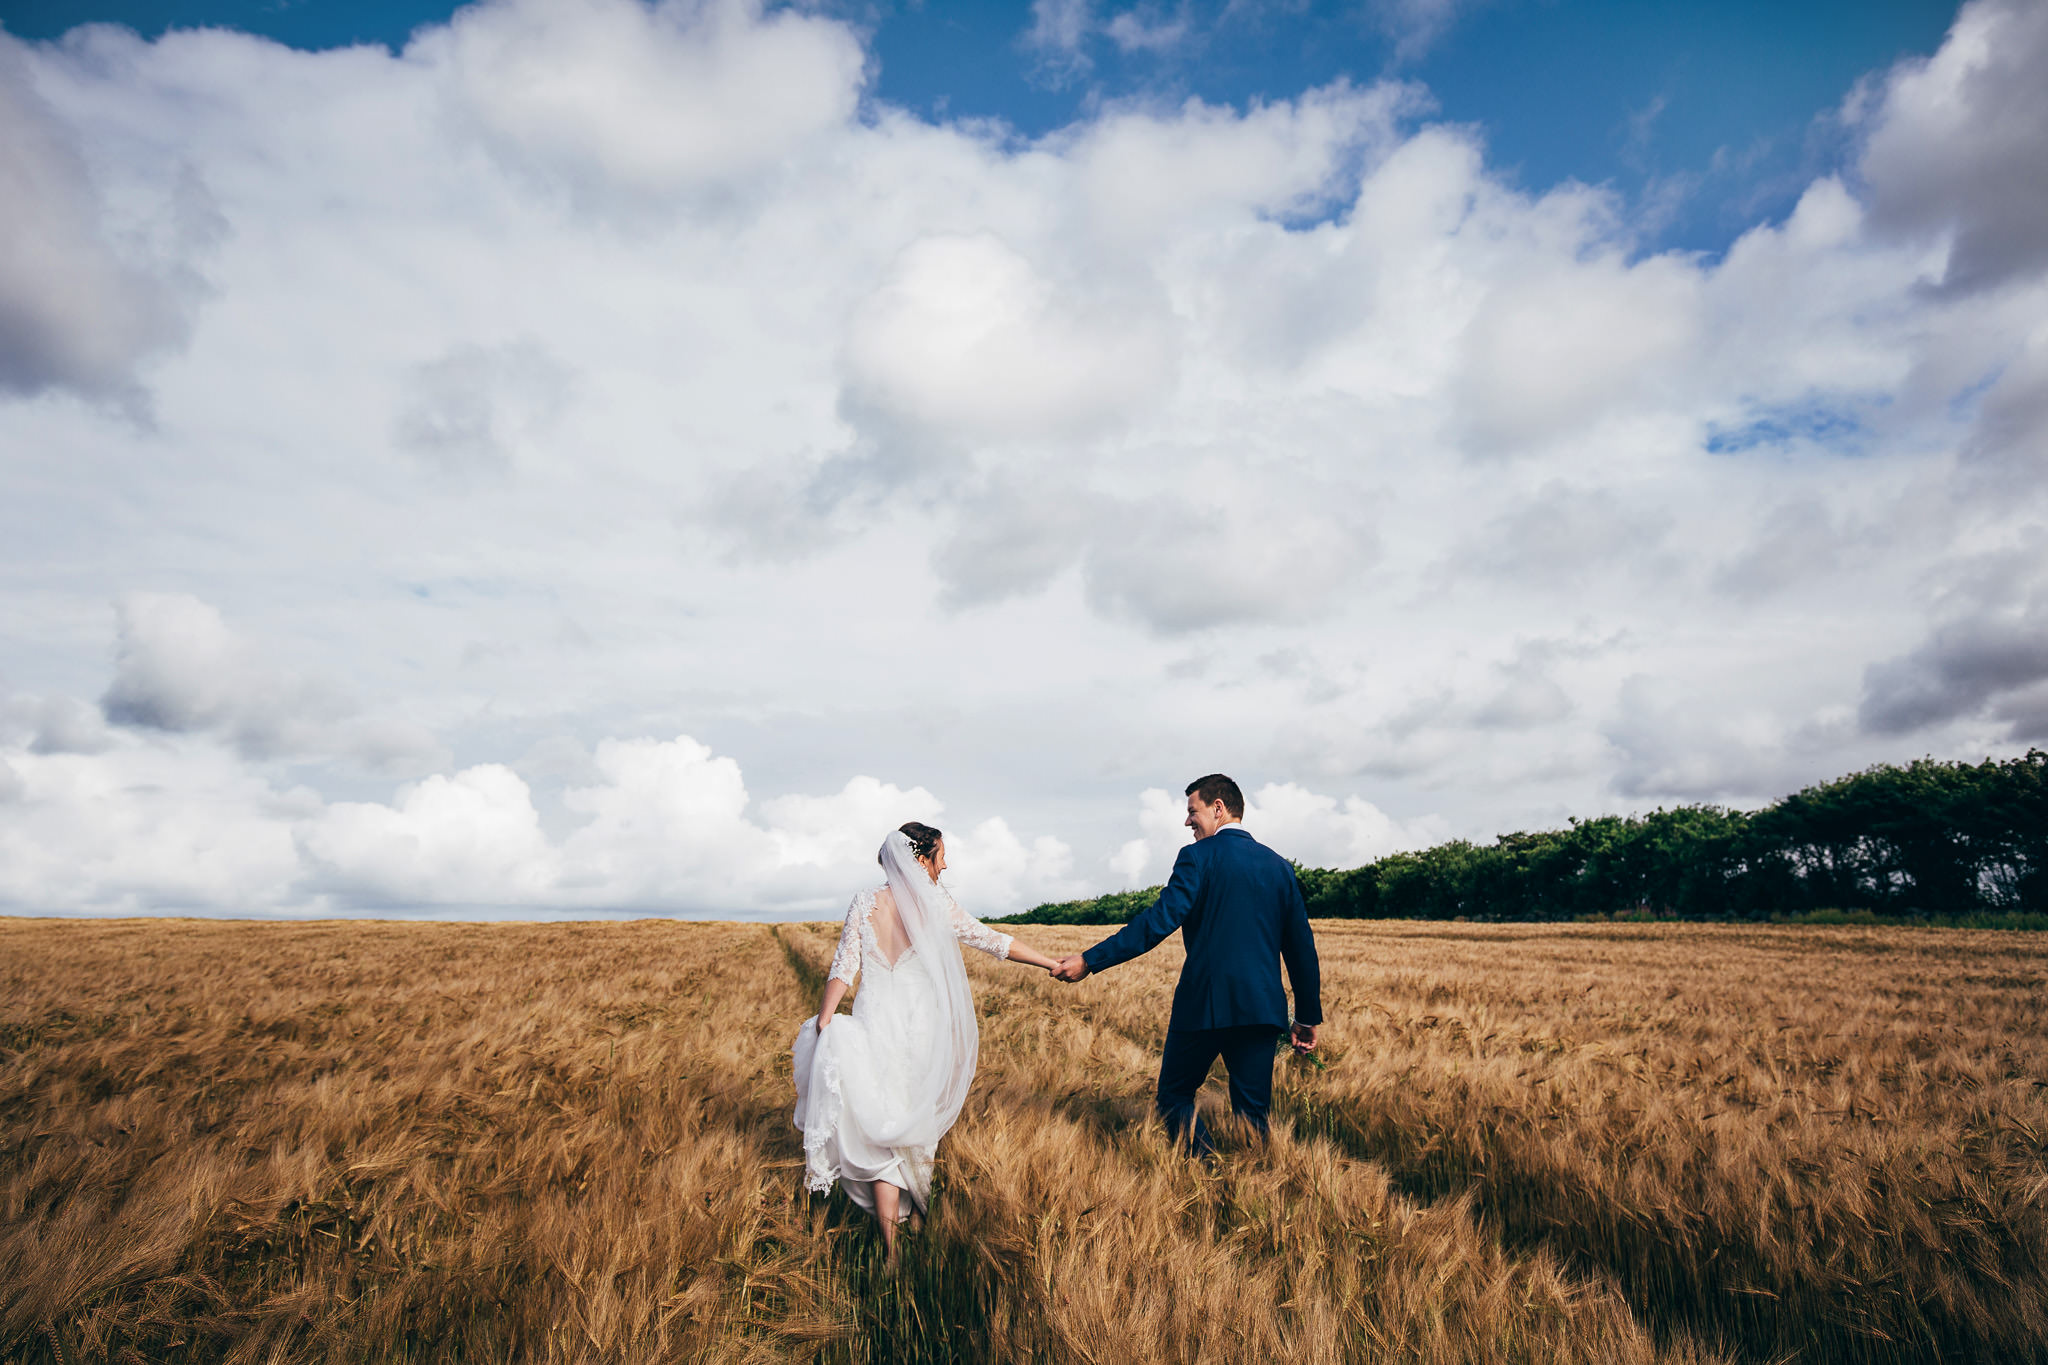 Norway+wedding+photographer+elopement+pre+wedding+Rogaland+bryllupsfotograf+Casey+Arneson-146.jpg